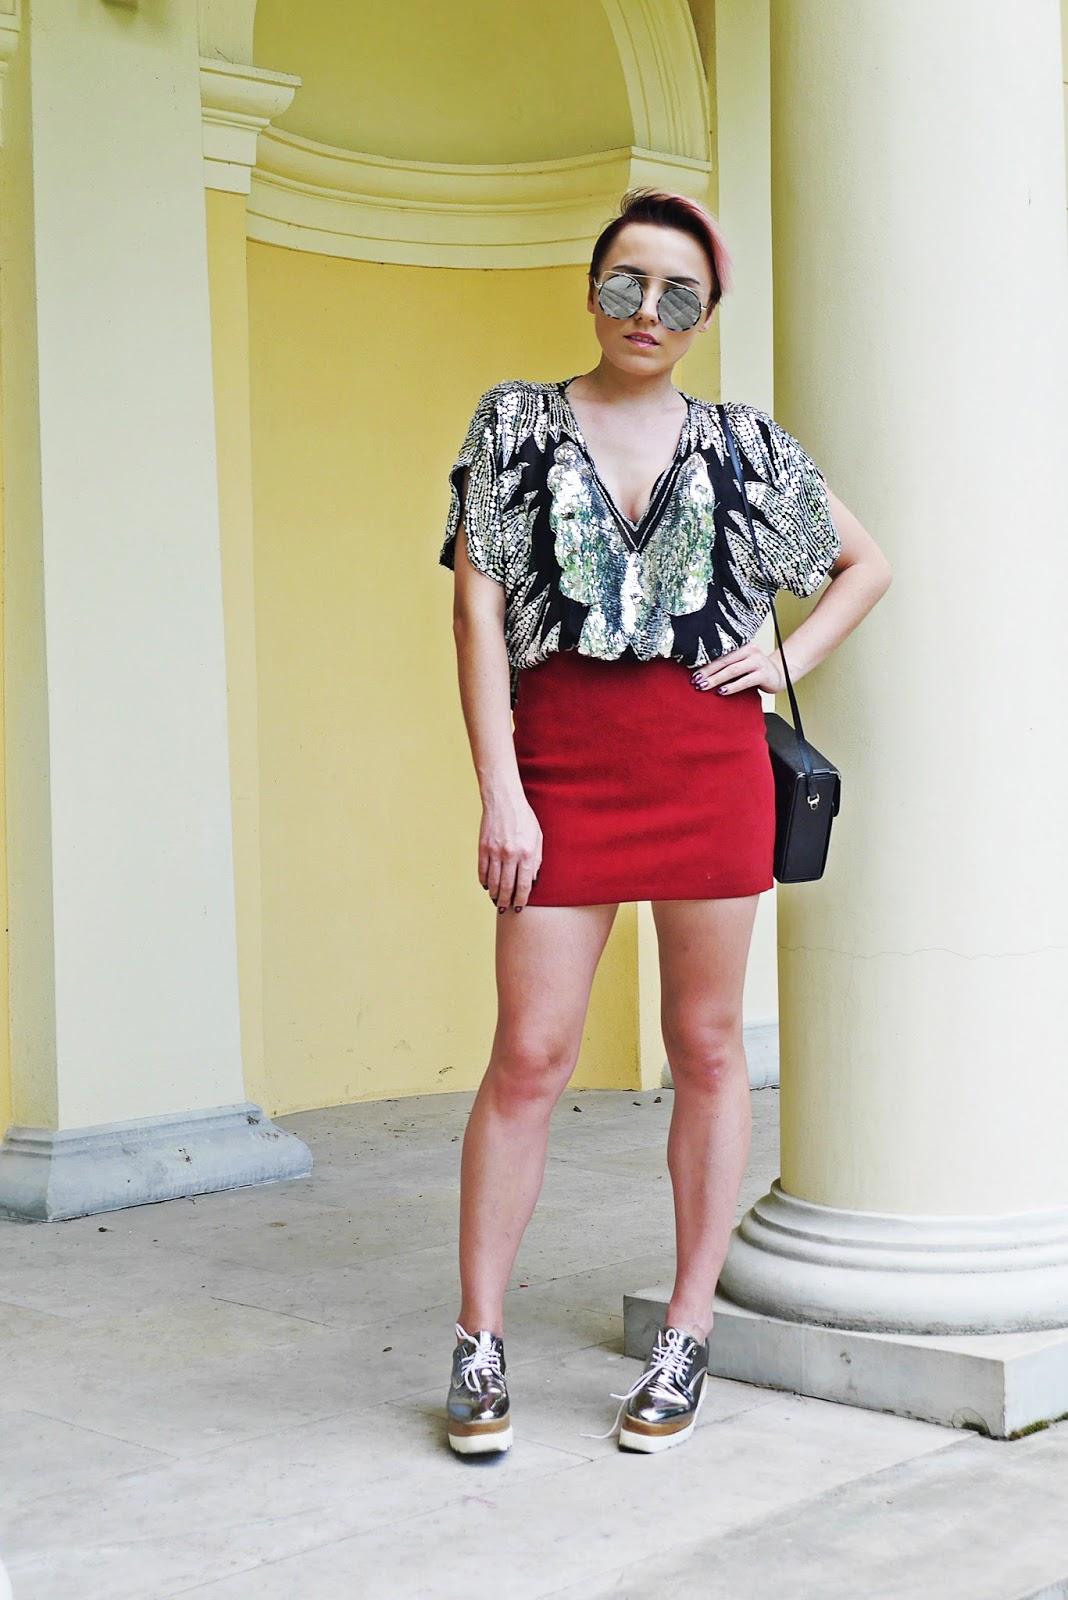 blog_modowy_blogerka_modowa_karyn_look_pulawy_300517